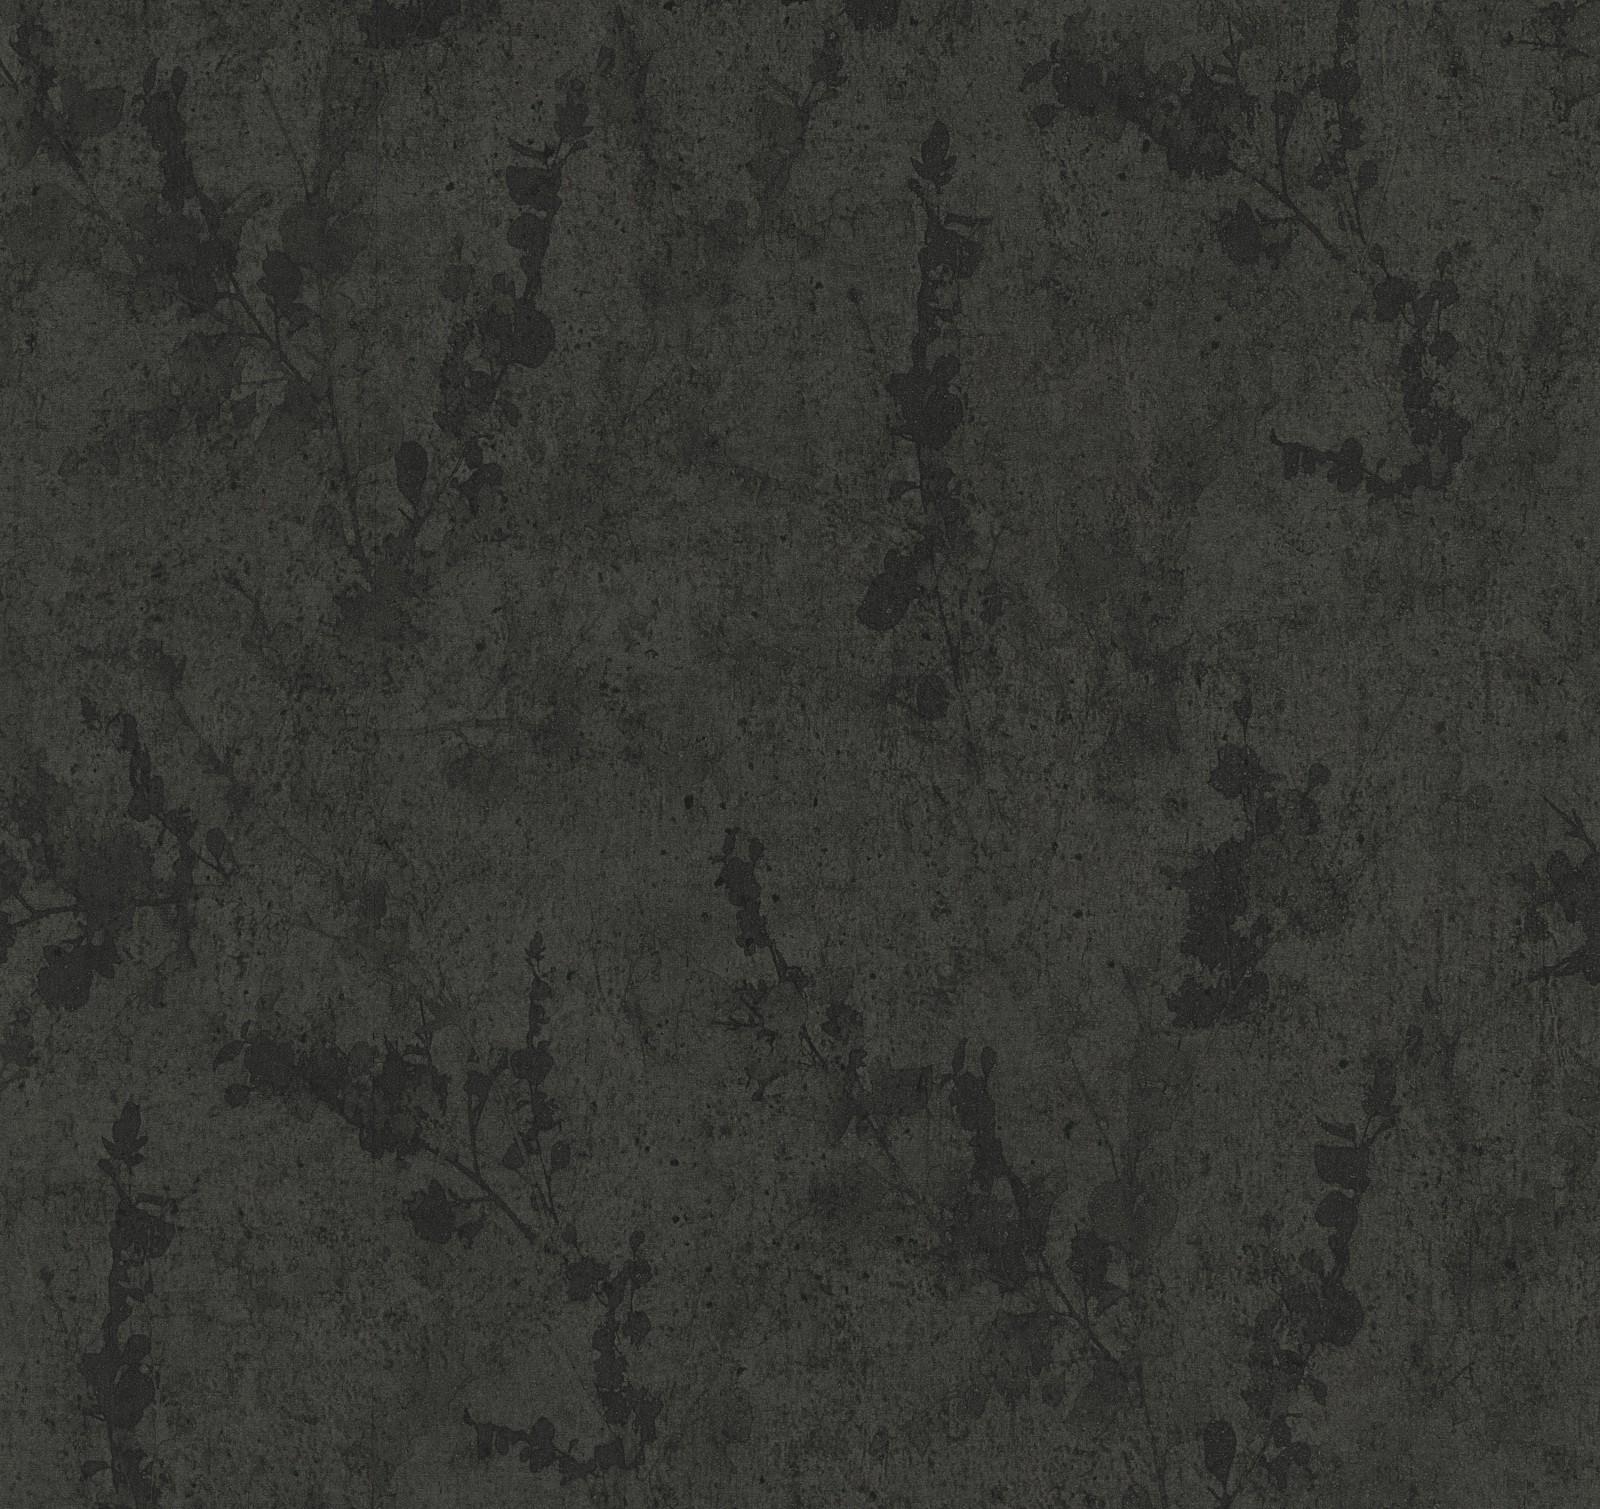 tapete guido maria kretschmer beton schwarz 02462 30. Black Bedroom Furniture Sets. Home Design Ideas